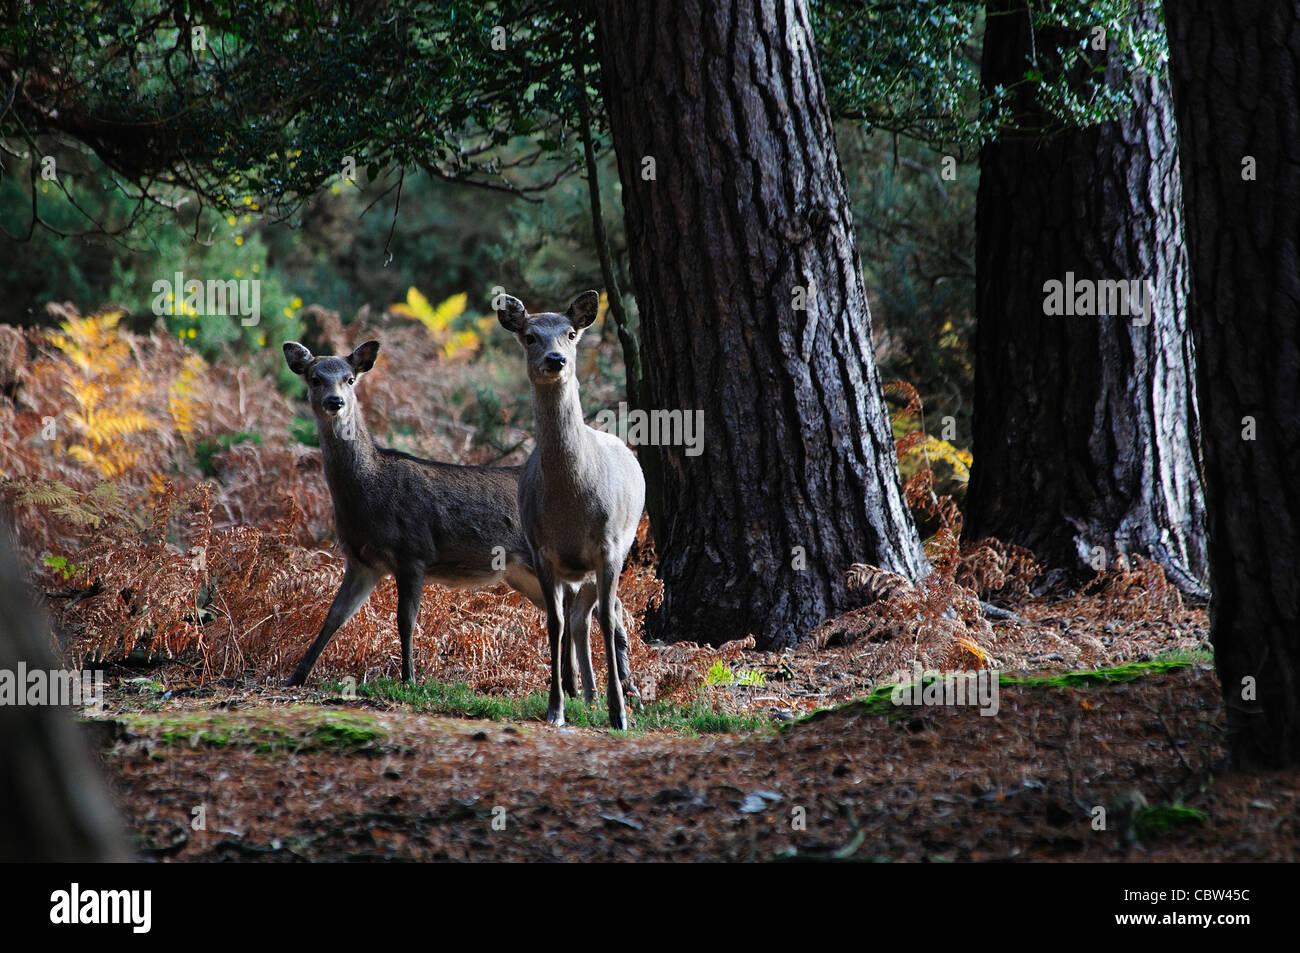 Twi sika deer on the heathland UK - Stock Image